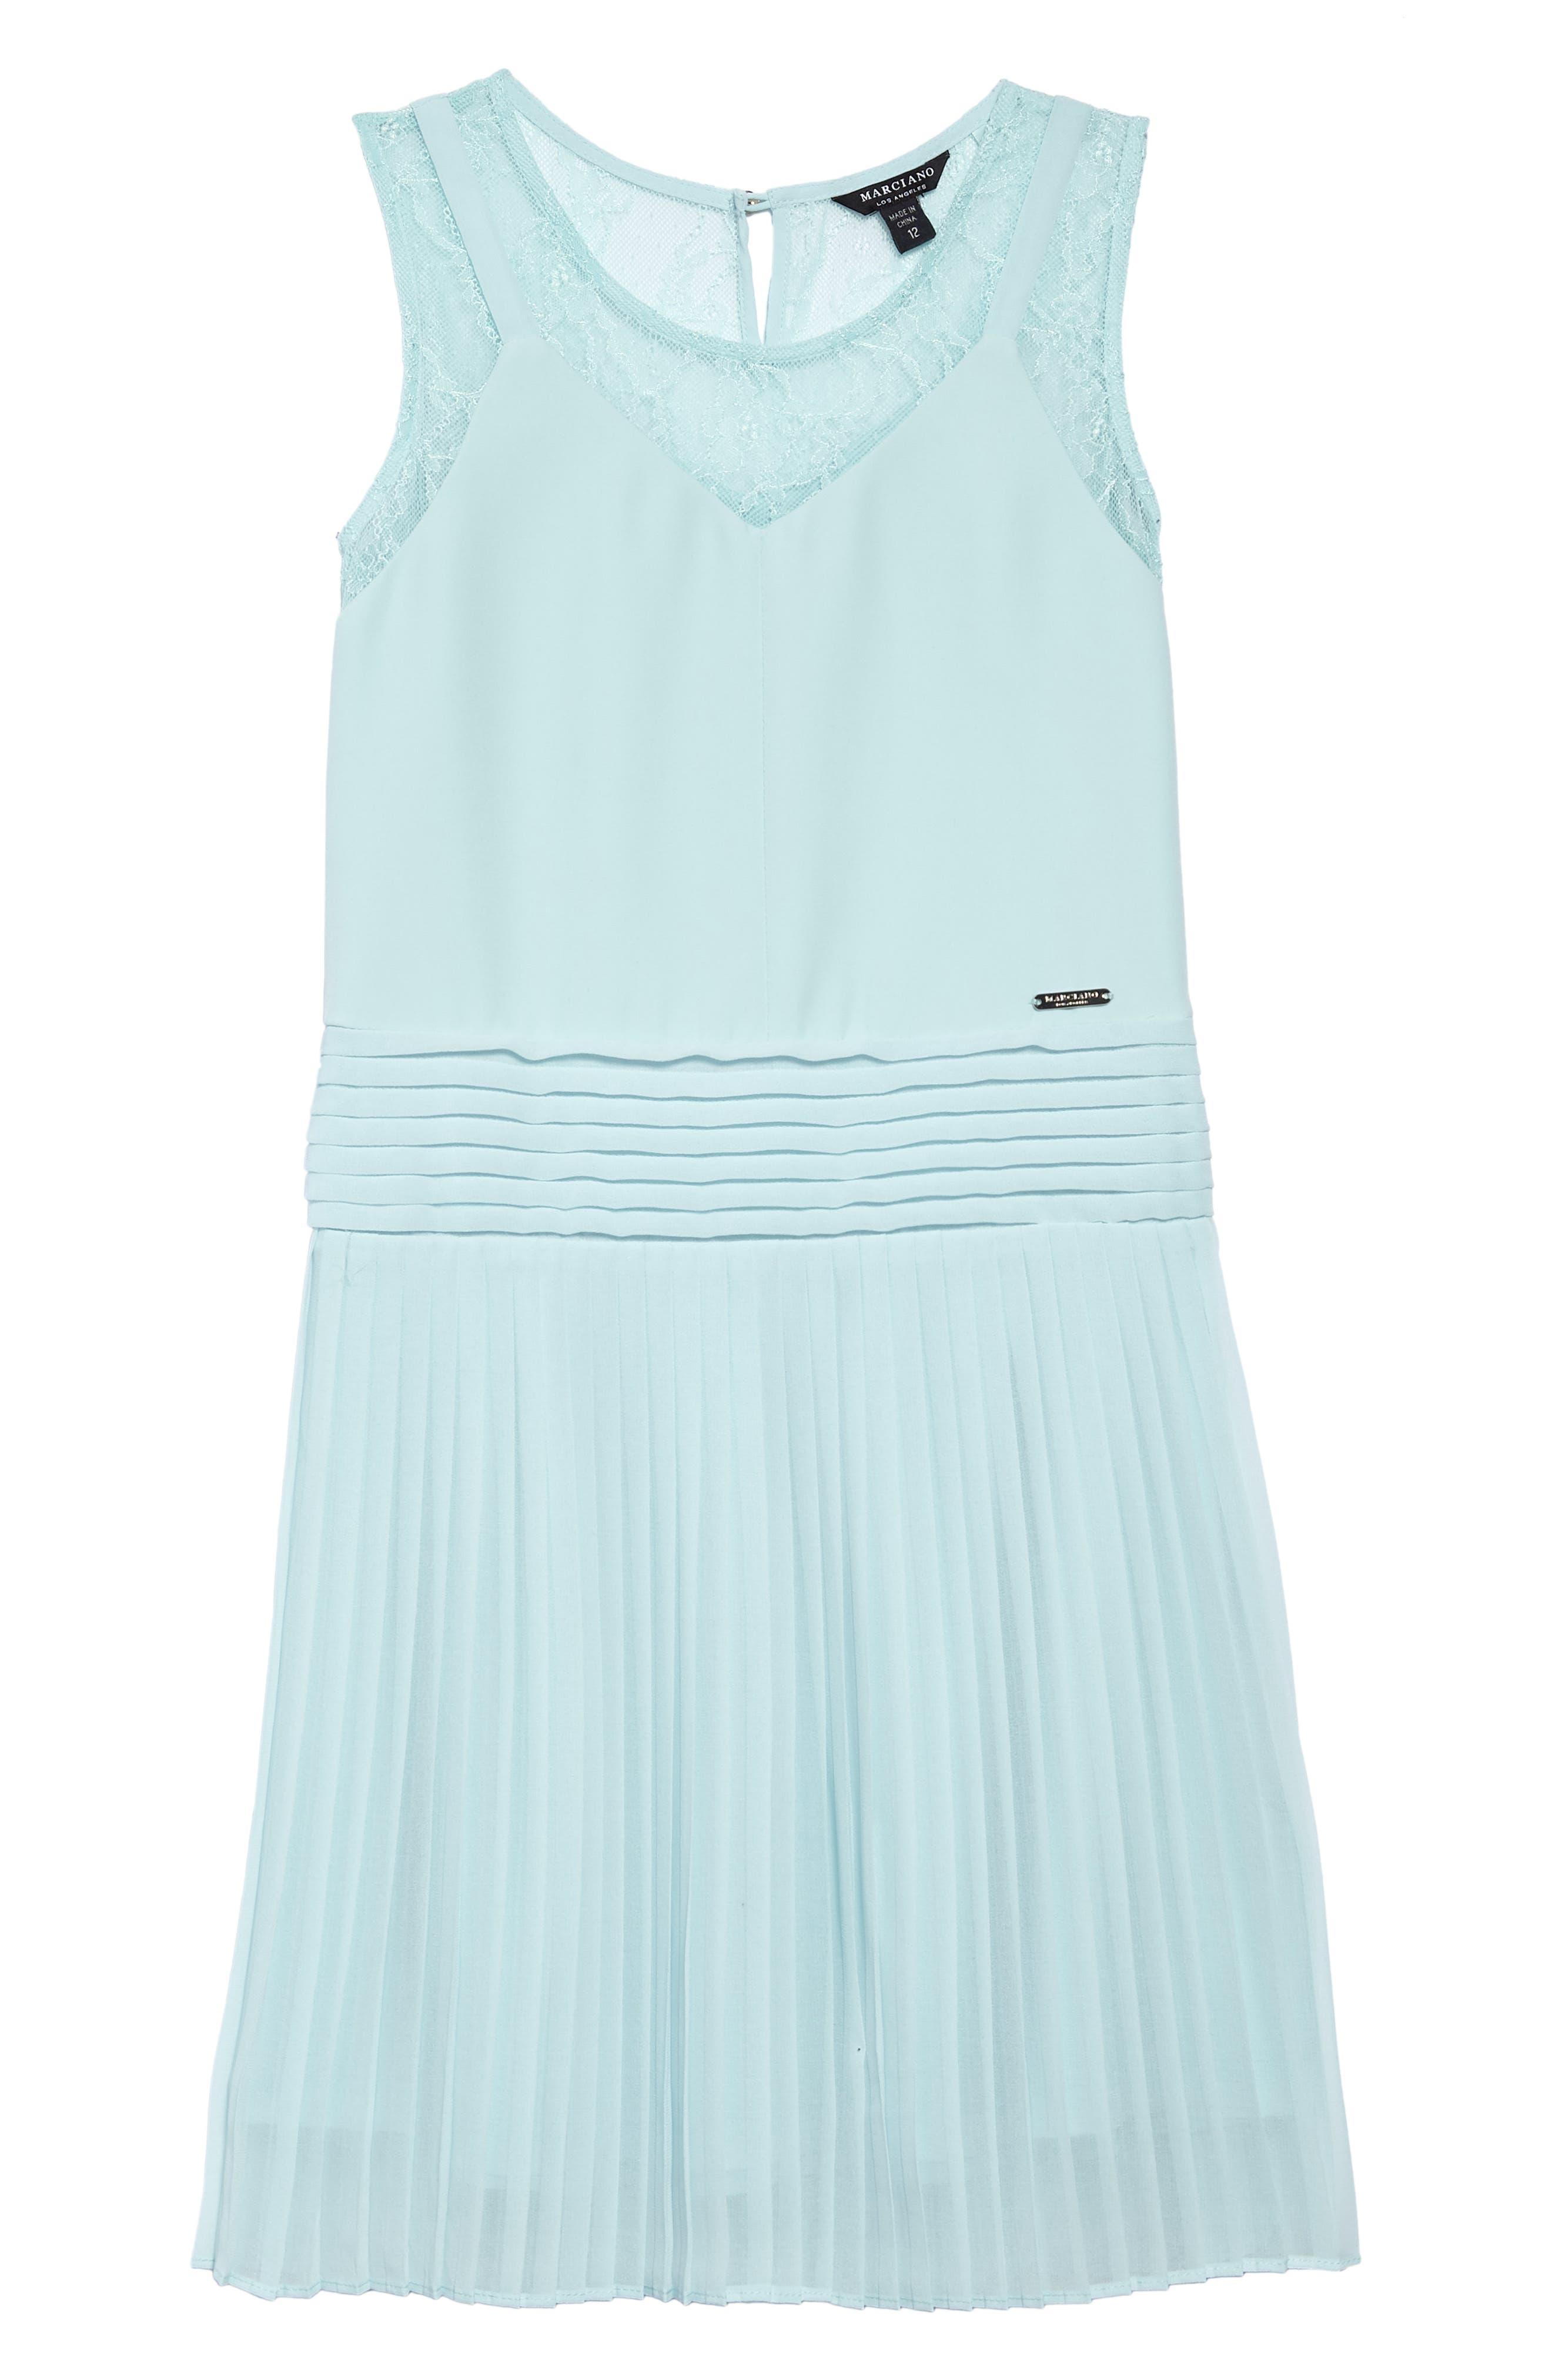 Pleated Chiffon Party Dress,                         Main,                         color, Beau Blue